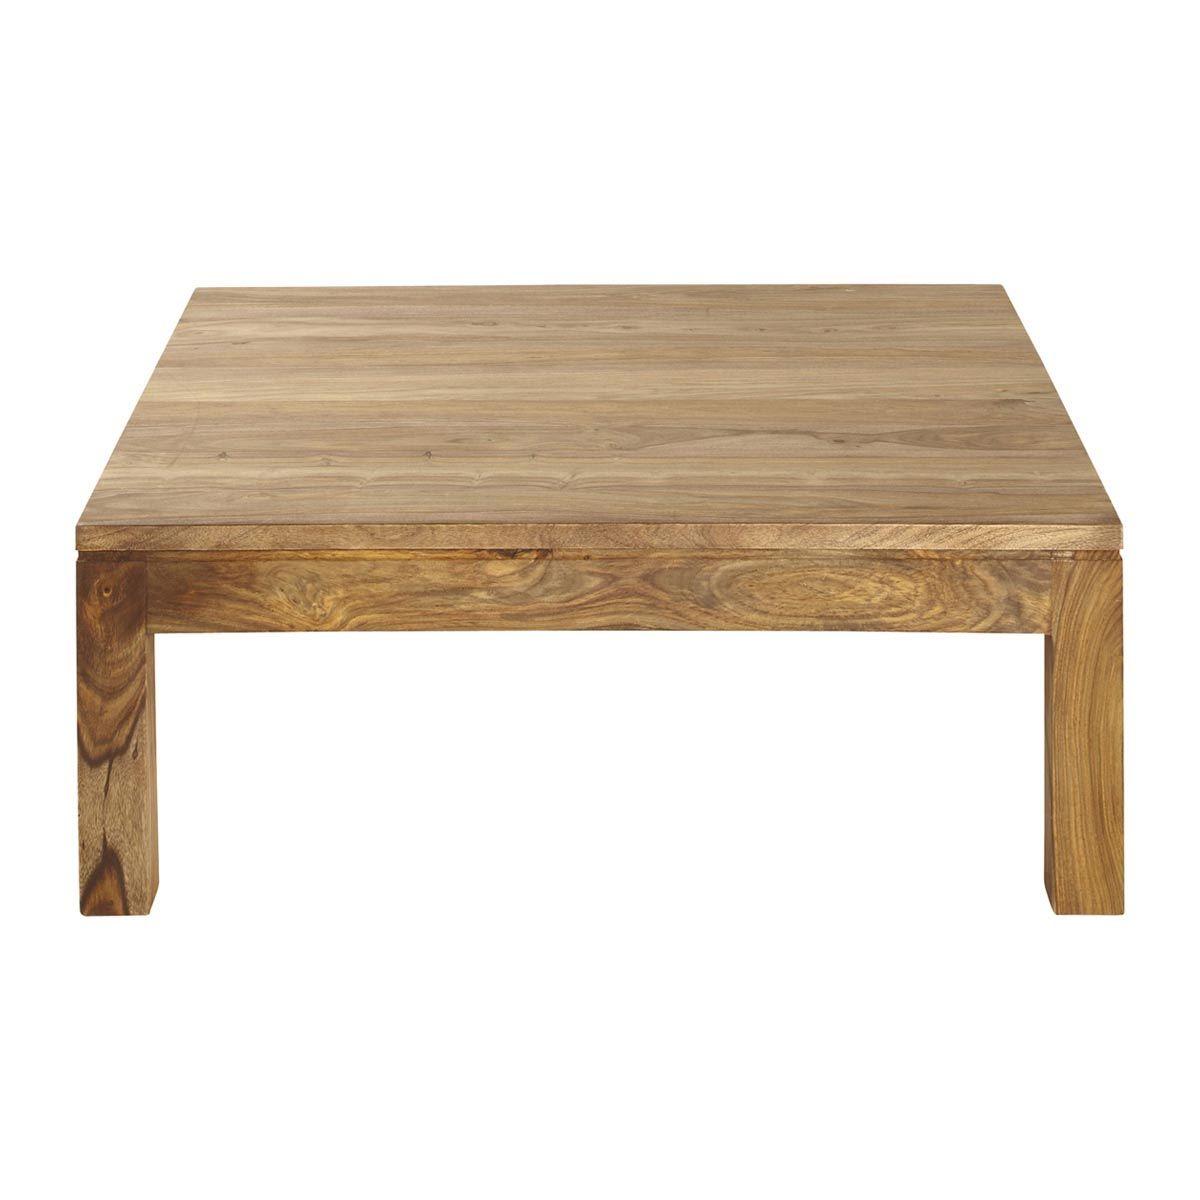 Table Basse En Sheesham Massif Table Italy Table Wood